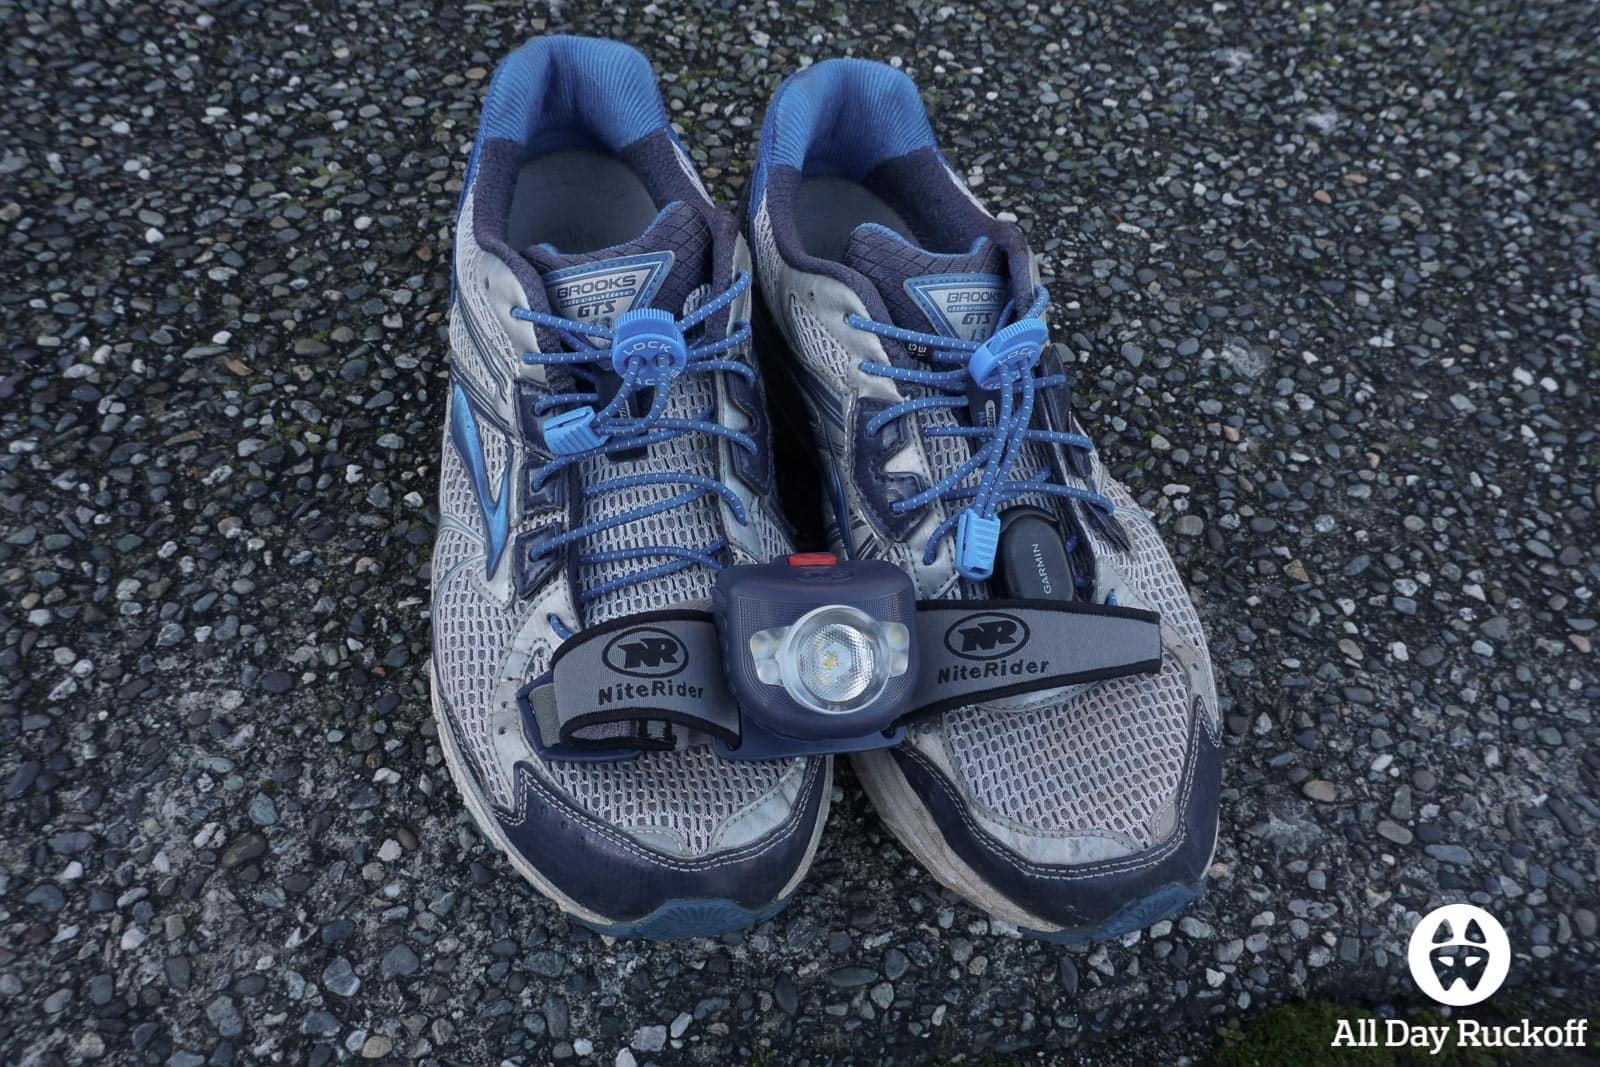 NiteRider Adventure 180 - Running Shoes Bottom